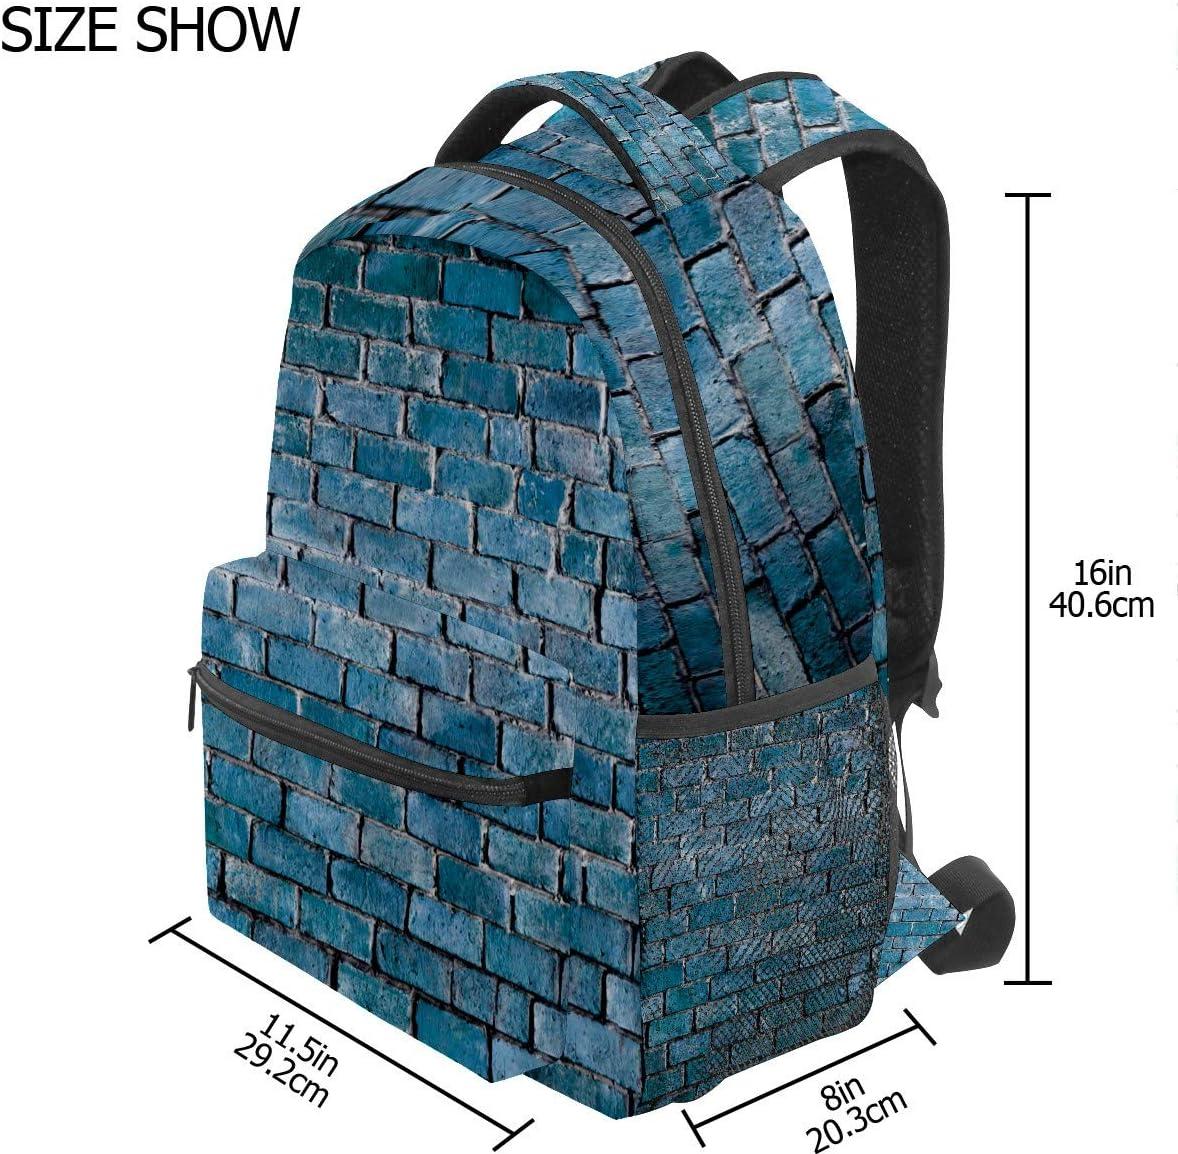 Backpack School Bag Casual Travel Daypack Bookbag,Student Sports Bag Gifts for Men Women Teenage Girl BoyRucksack Blue Brick Wall Background